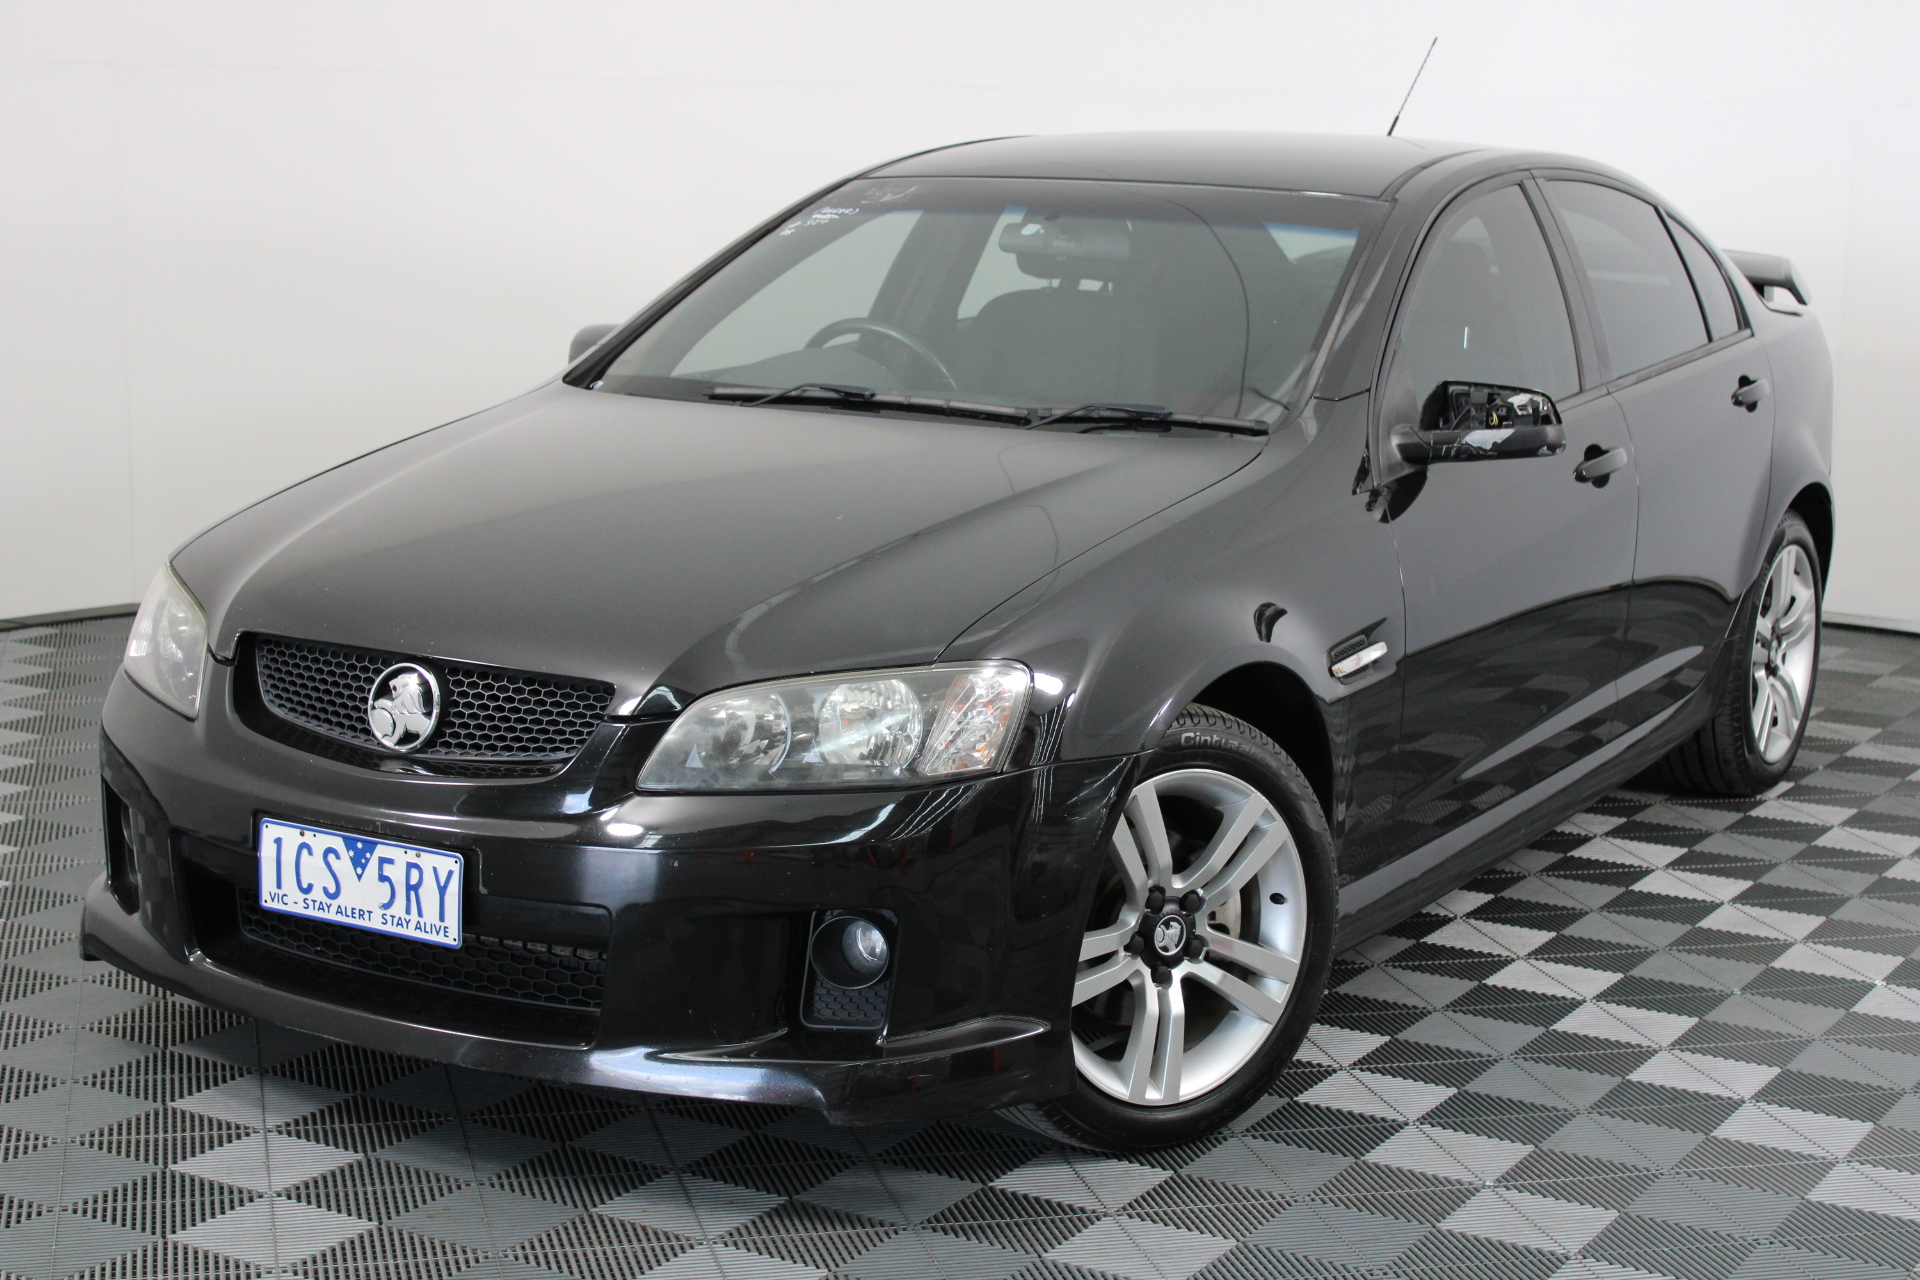 2008 Holden Commodore SV6 VE Automatic Sedan